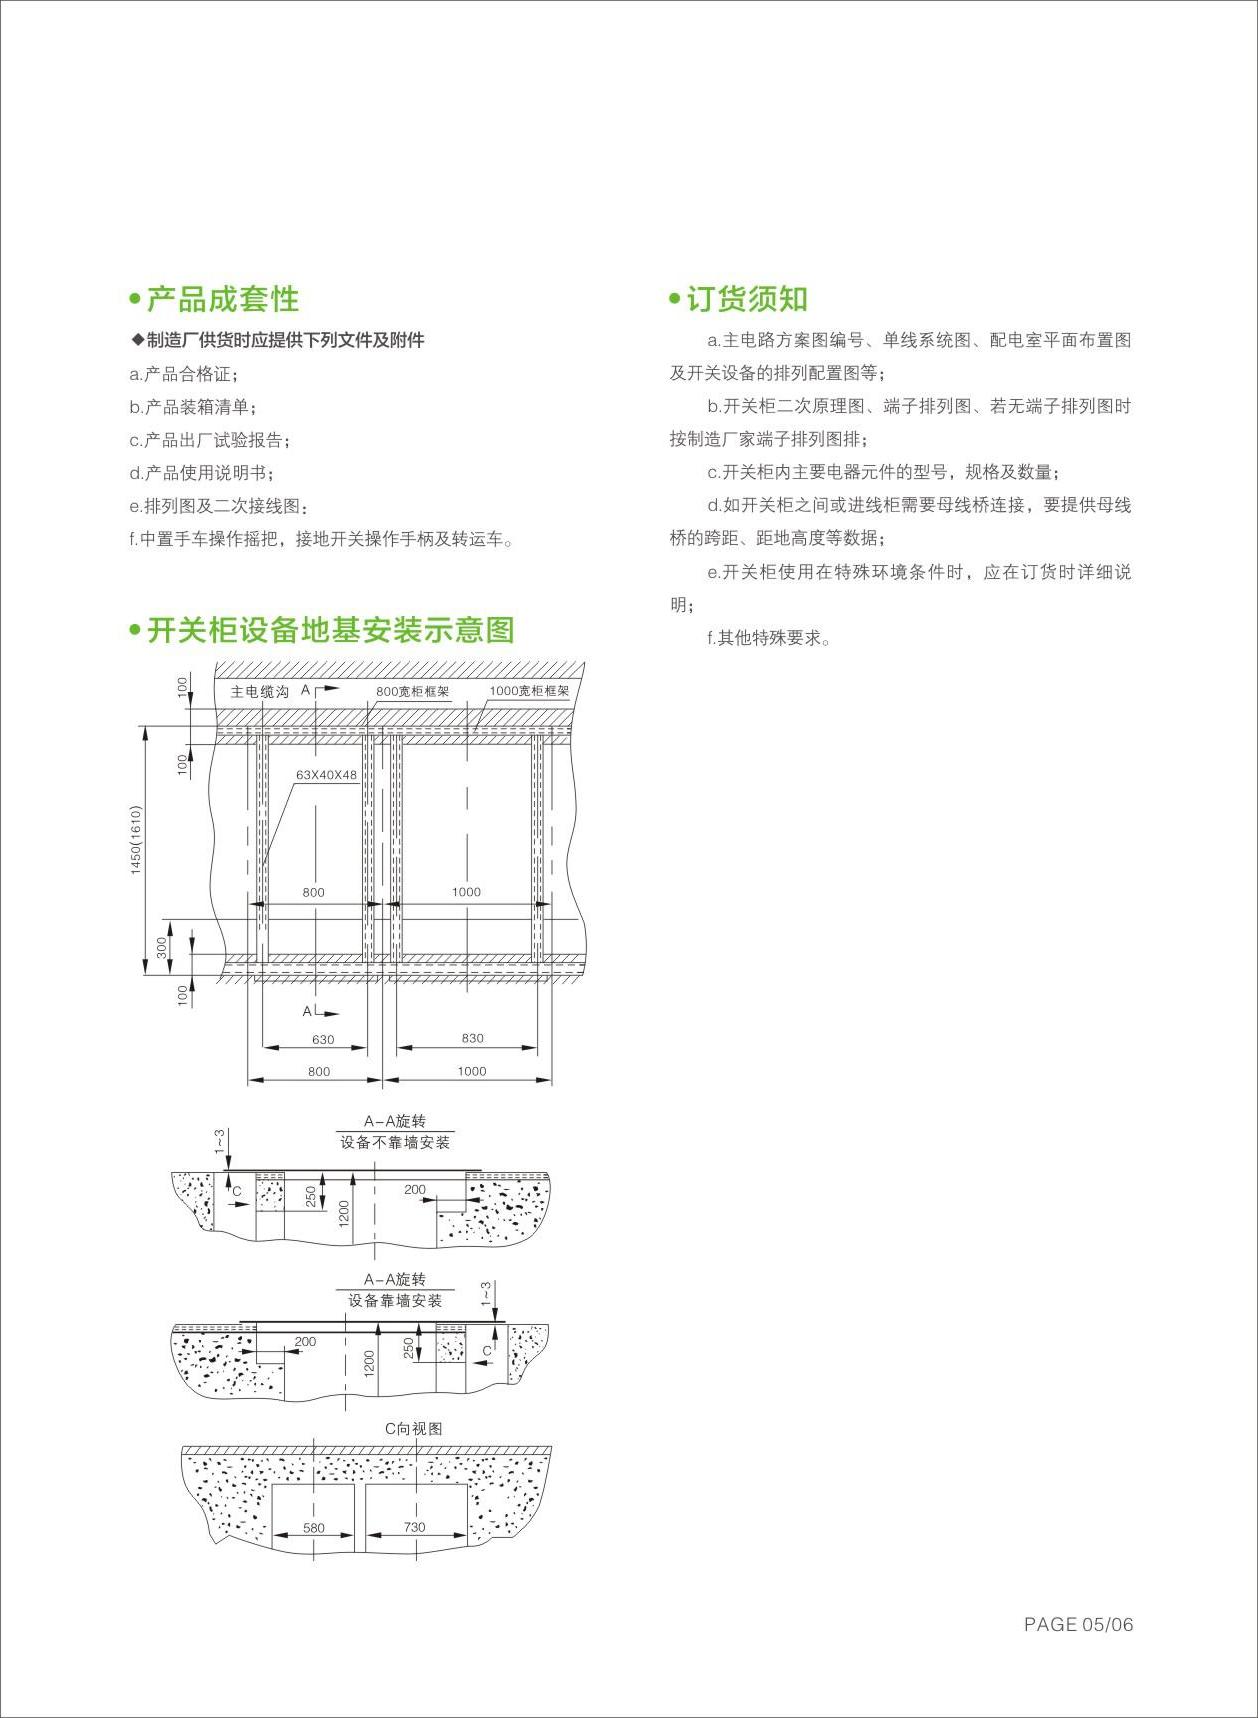 KYN28-24型铠户内交换金属铠装移出式开关设备-03